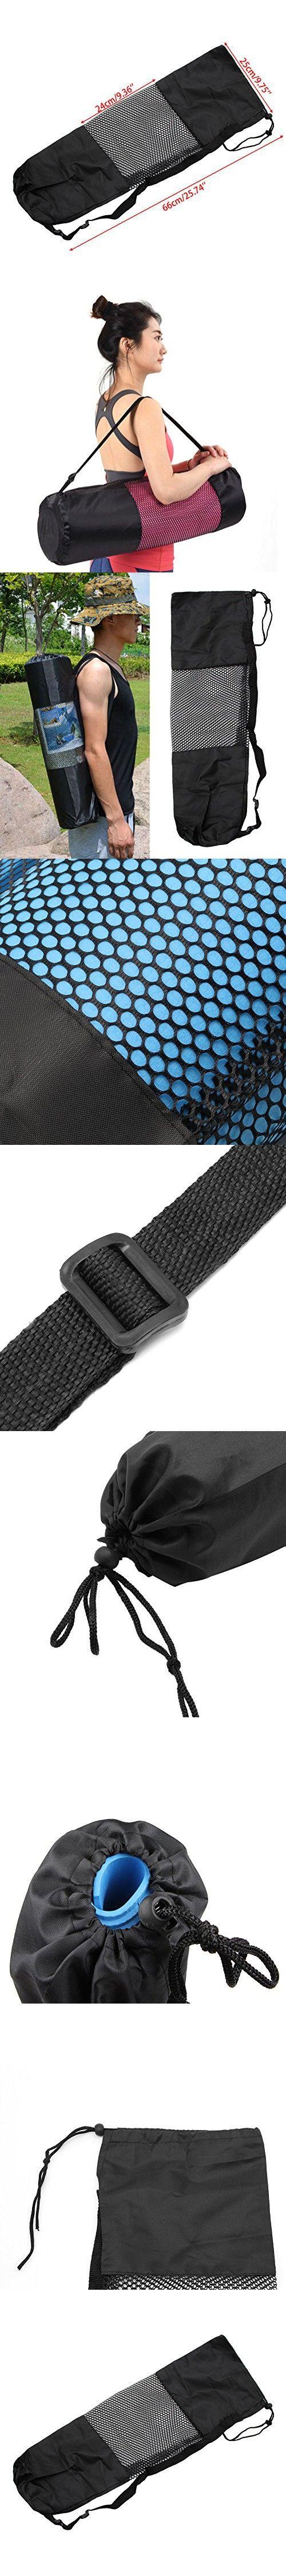 Tangc Adjustable Strap Nylon Mat Bag Carrier Mesh For Yoga Gym Fitness Exercise Sports